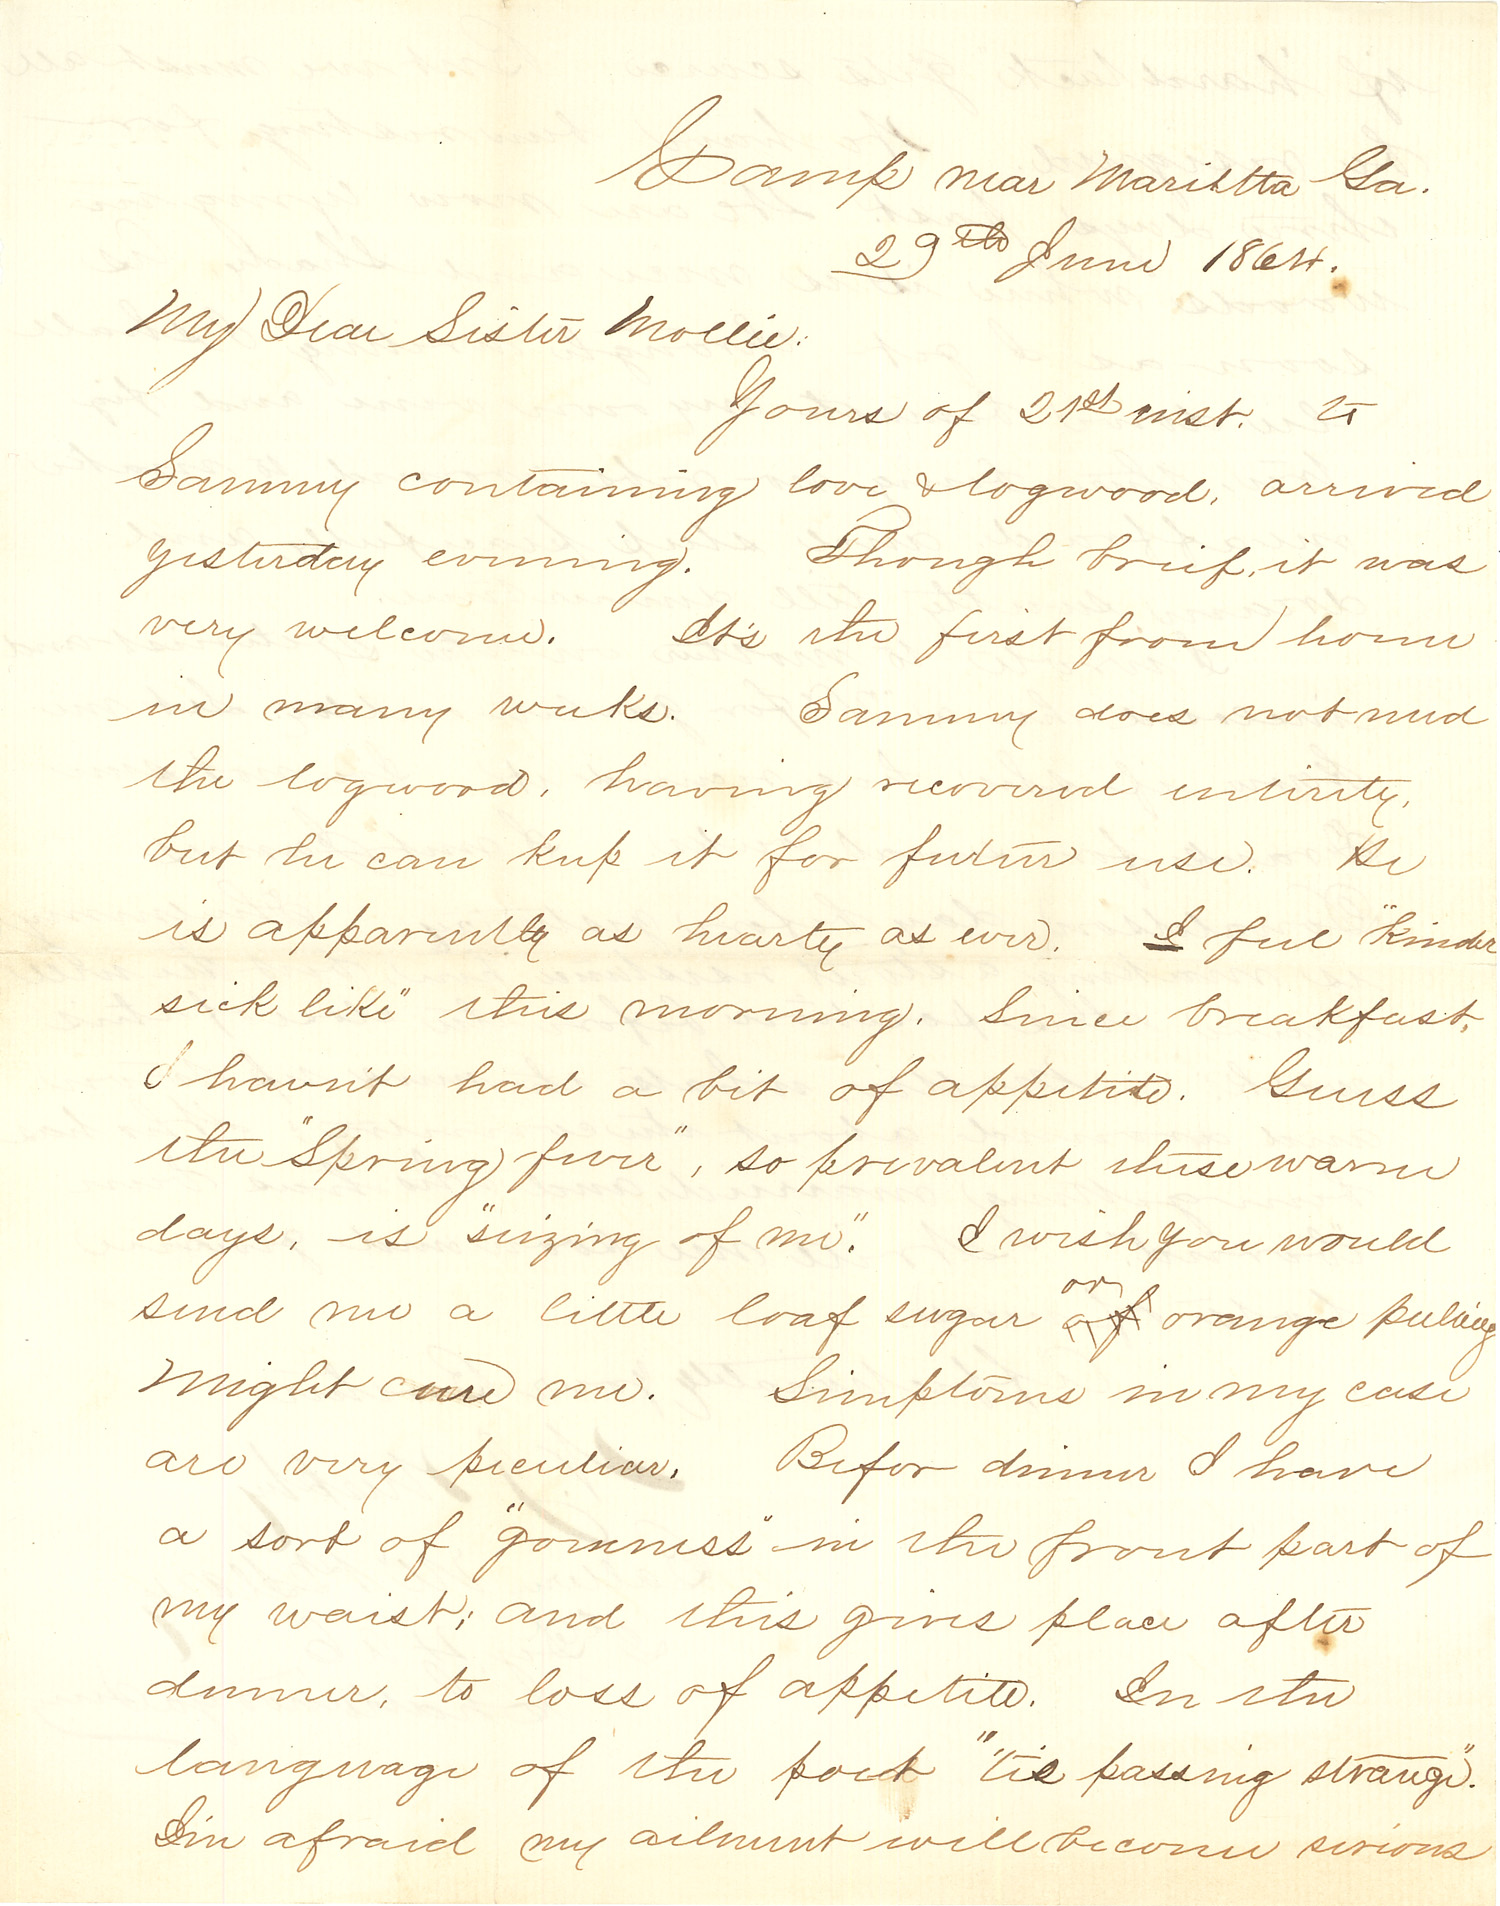 Joseph Culver Letter, June 29, 1864, Page 1